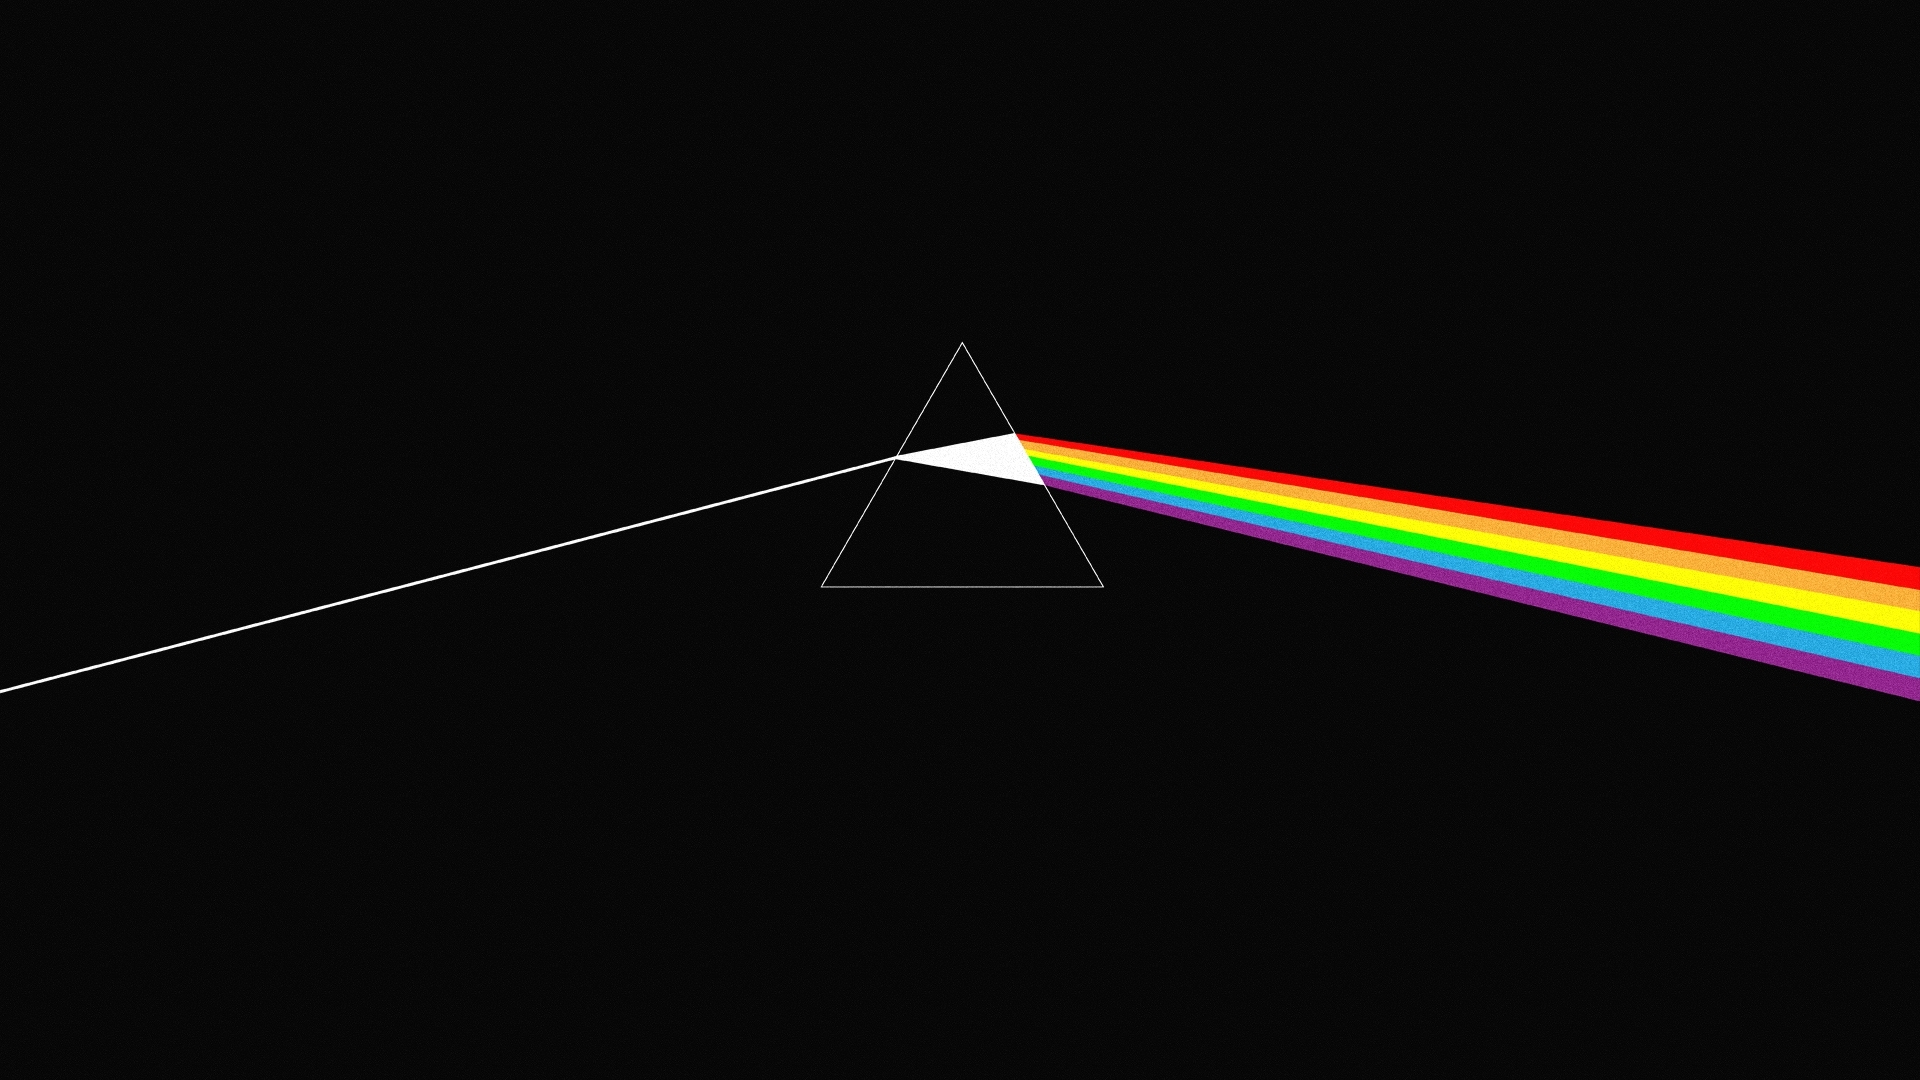 48 Wallpapers Pink Floyd On Wallpapersafari